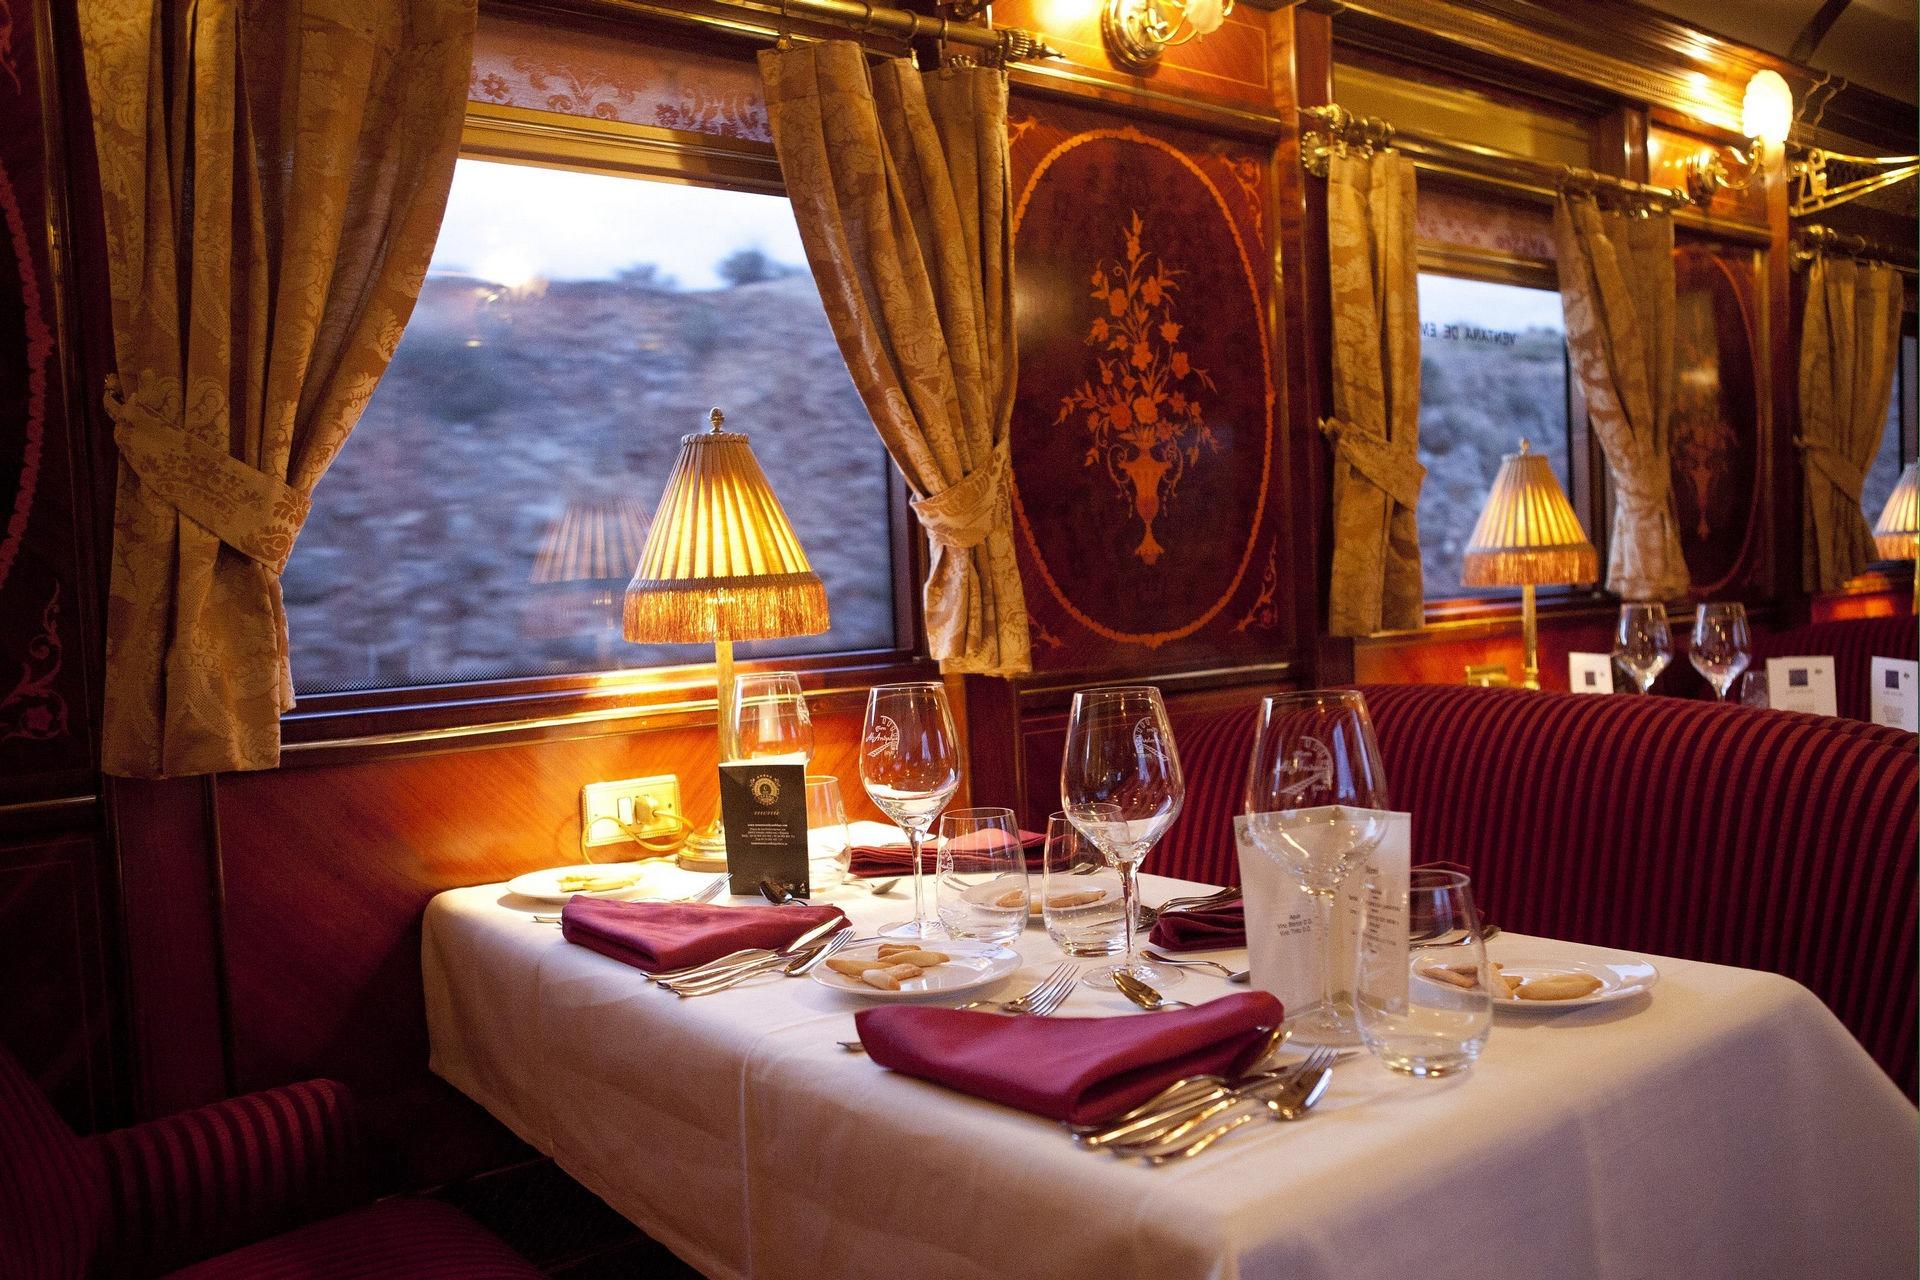 NOMAD-luksusowe-pociągi-w-Hiszpani-Al-Andalus-09